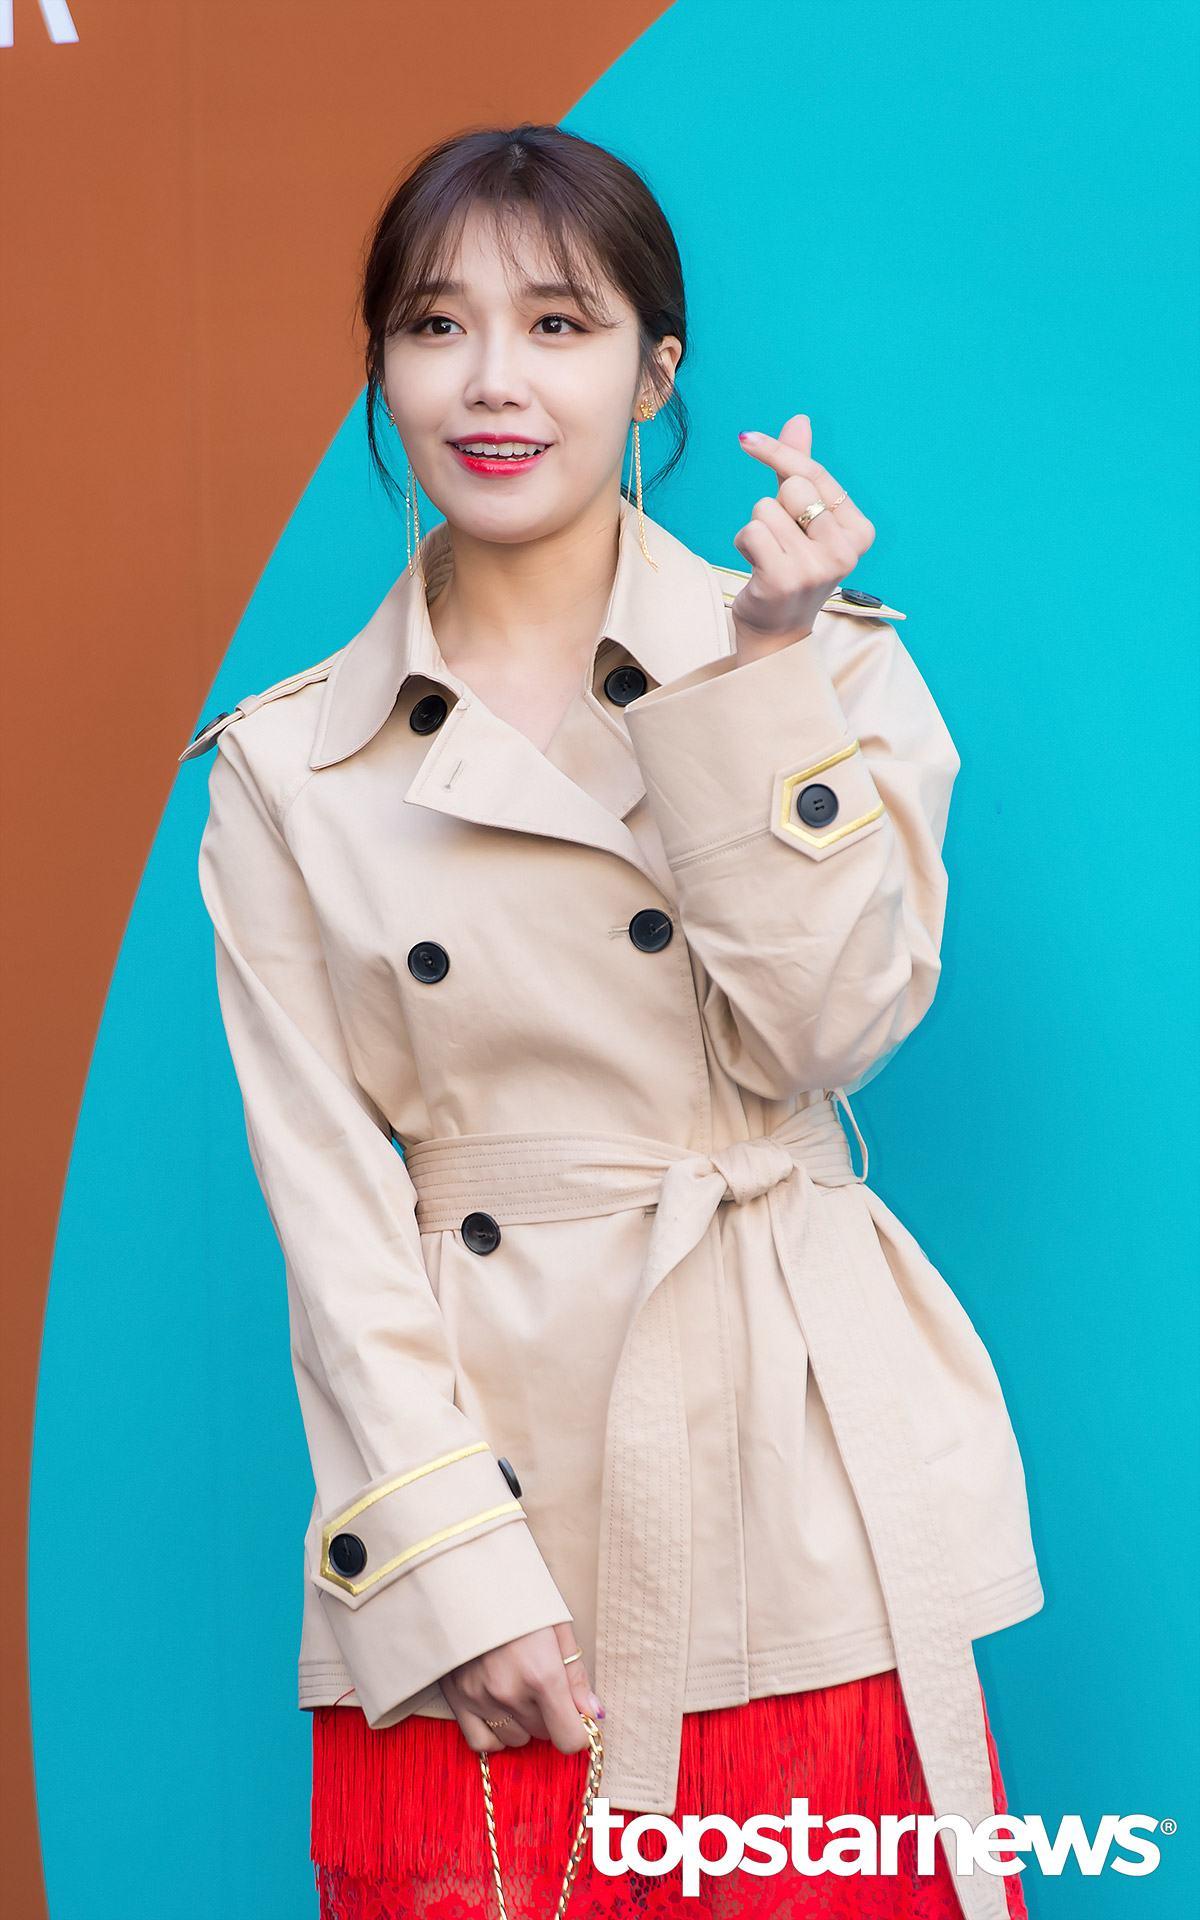 #Apink - 恩地  兩個月 恩地在出道前已因其有力的聲線和不俗的歌唱技巧為人所熟知,更受到包括Super Junior希澈和2AM珍雲等歌手的稱讚,她曾多次表示最初的夢想是成為一名聲樂教練,在出道前並無接受正規訓練的經驗,在參加2011年2月的Apink成員試鏡後,短短兩個月,於4月21日以組合名義閃電出道!